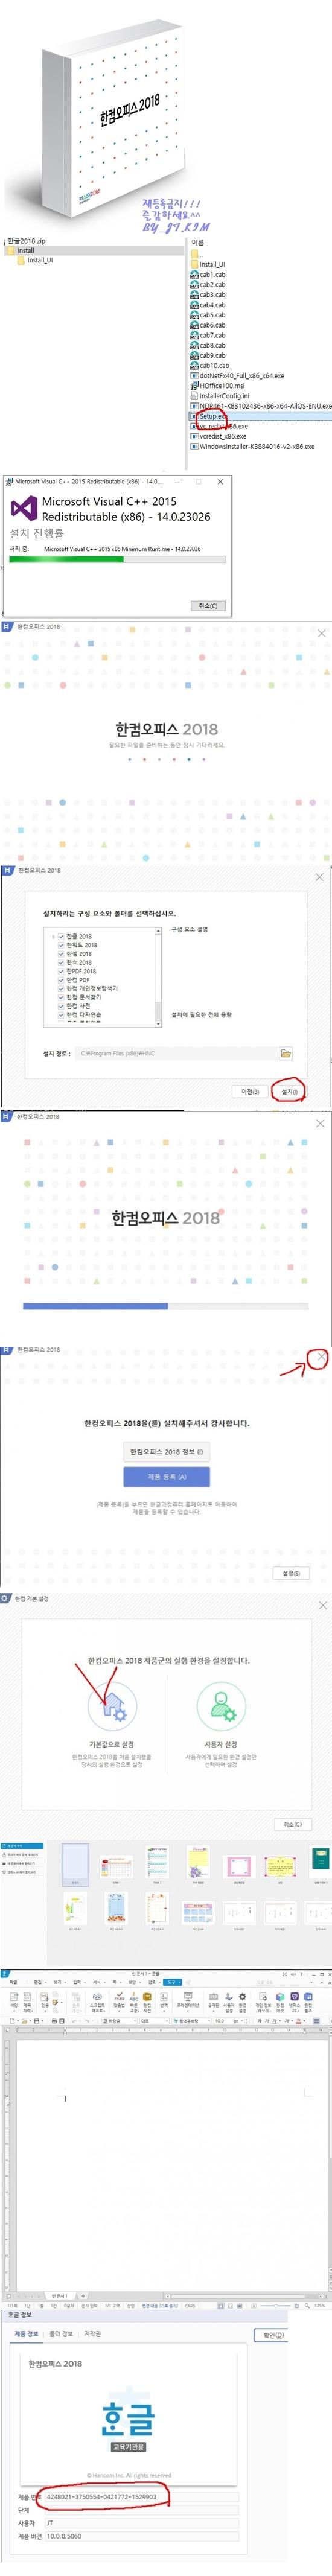 [HOT] 한글2018. 간편설치,자동인증.